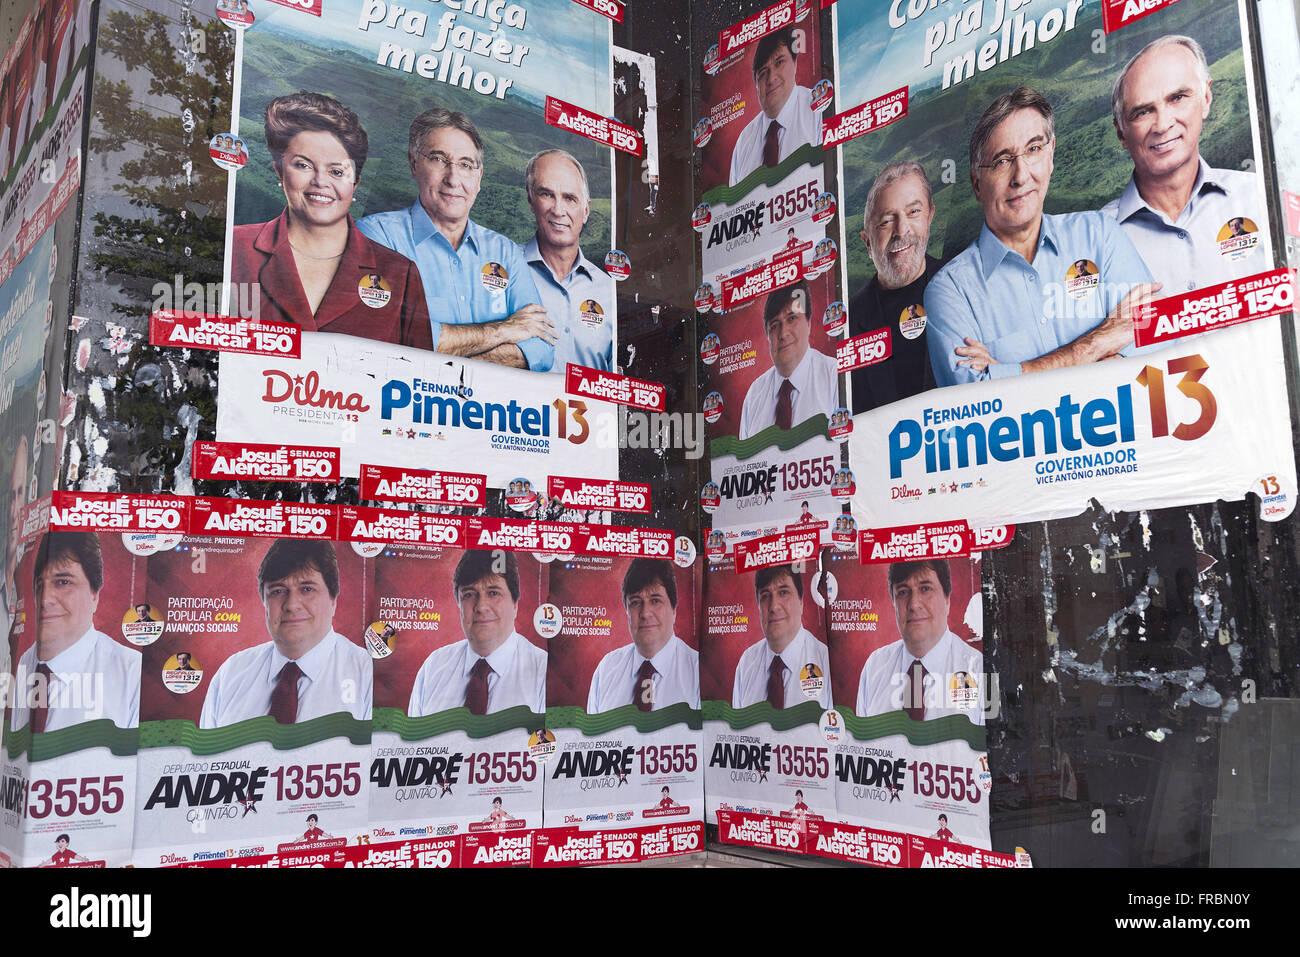 Political propaganda posters - Stock Image